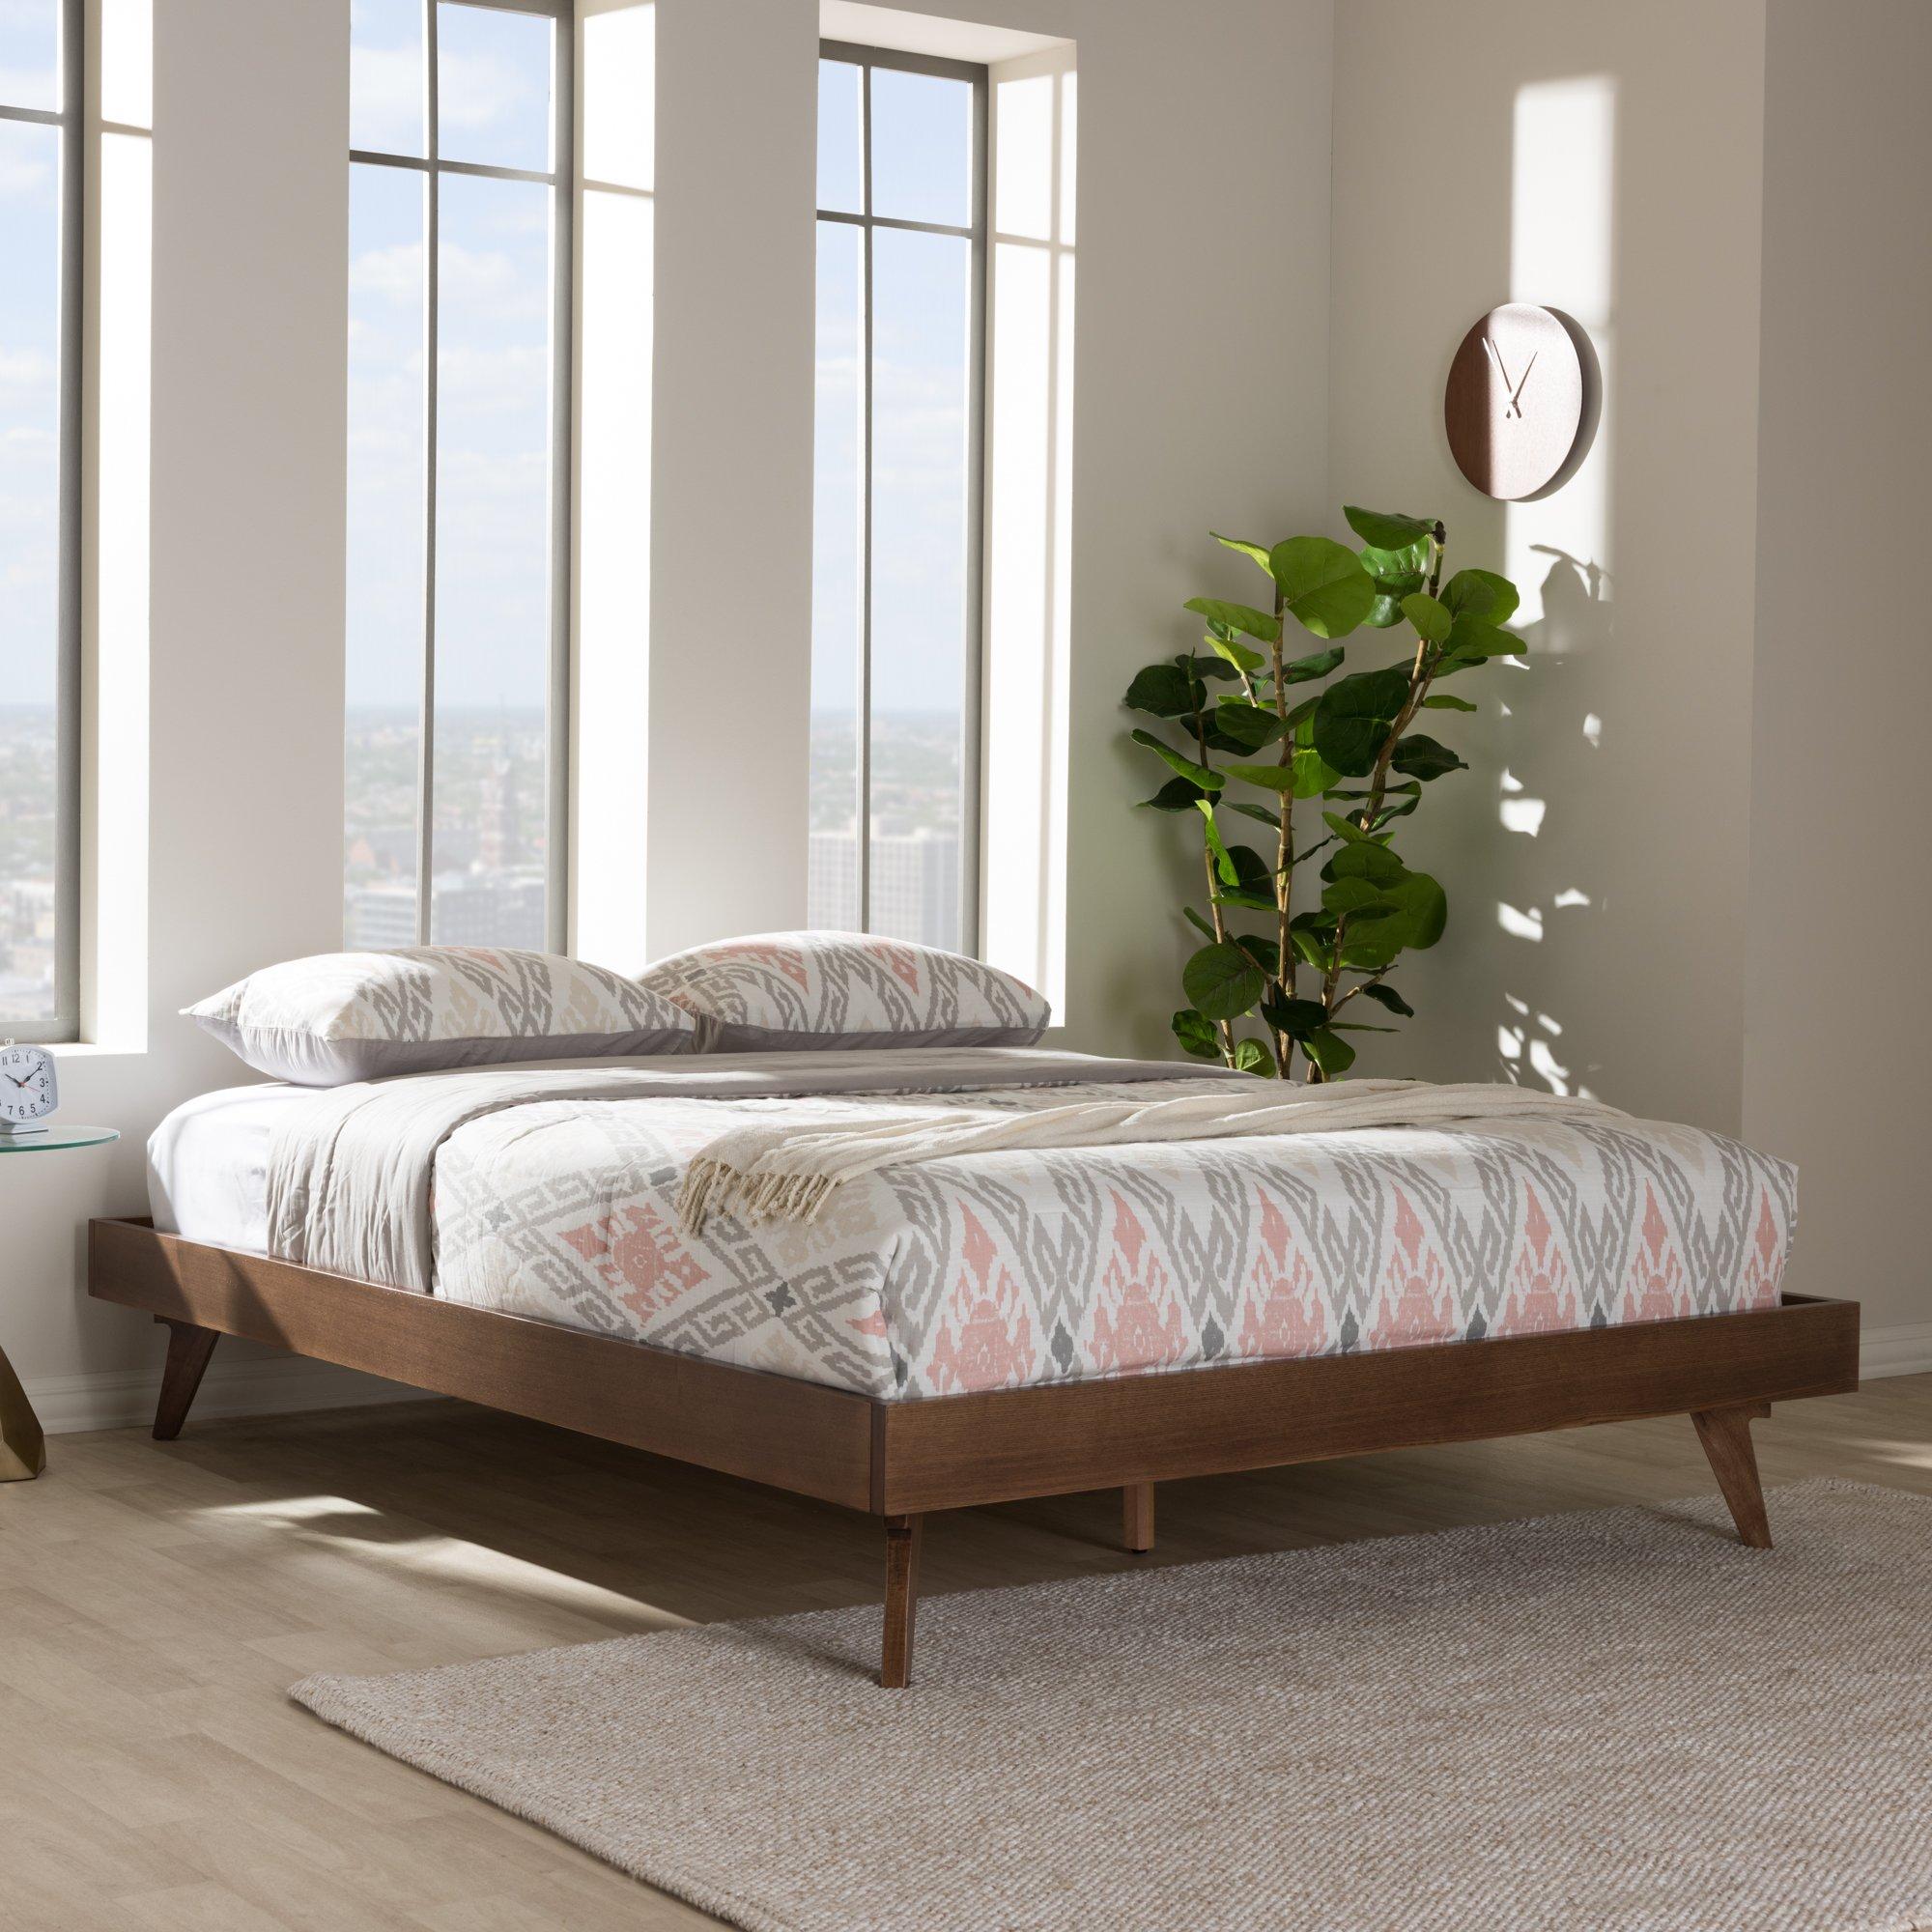 Baxton Studio Mid Century Modern Bed Frame in Walnut Finish (Queen: 83.07 in. L x 62.99 in. W x 13.19 in. H) by Baxton Studio